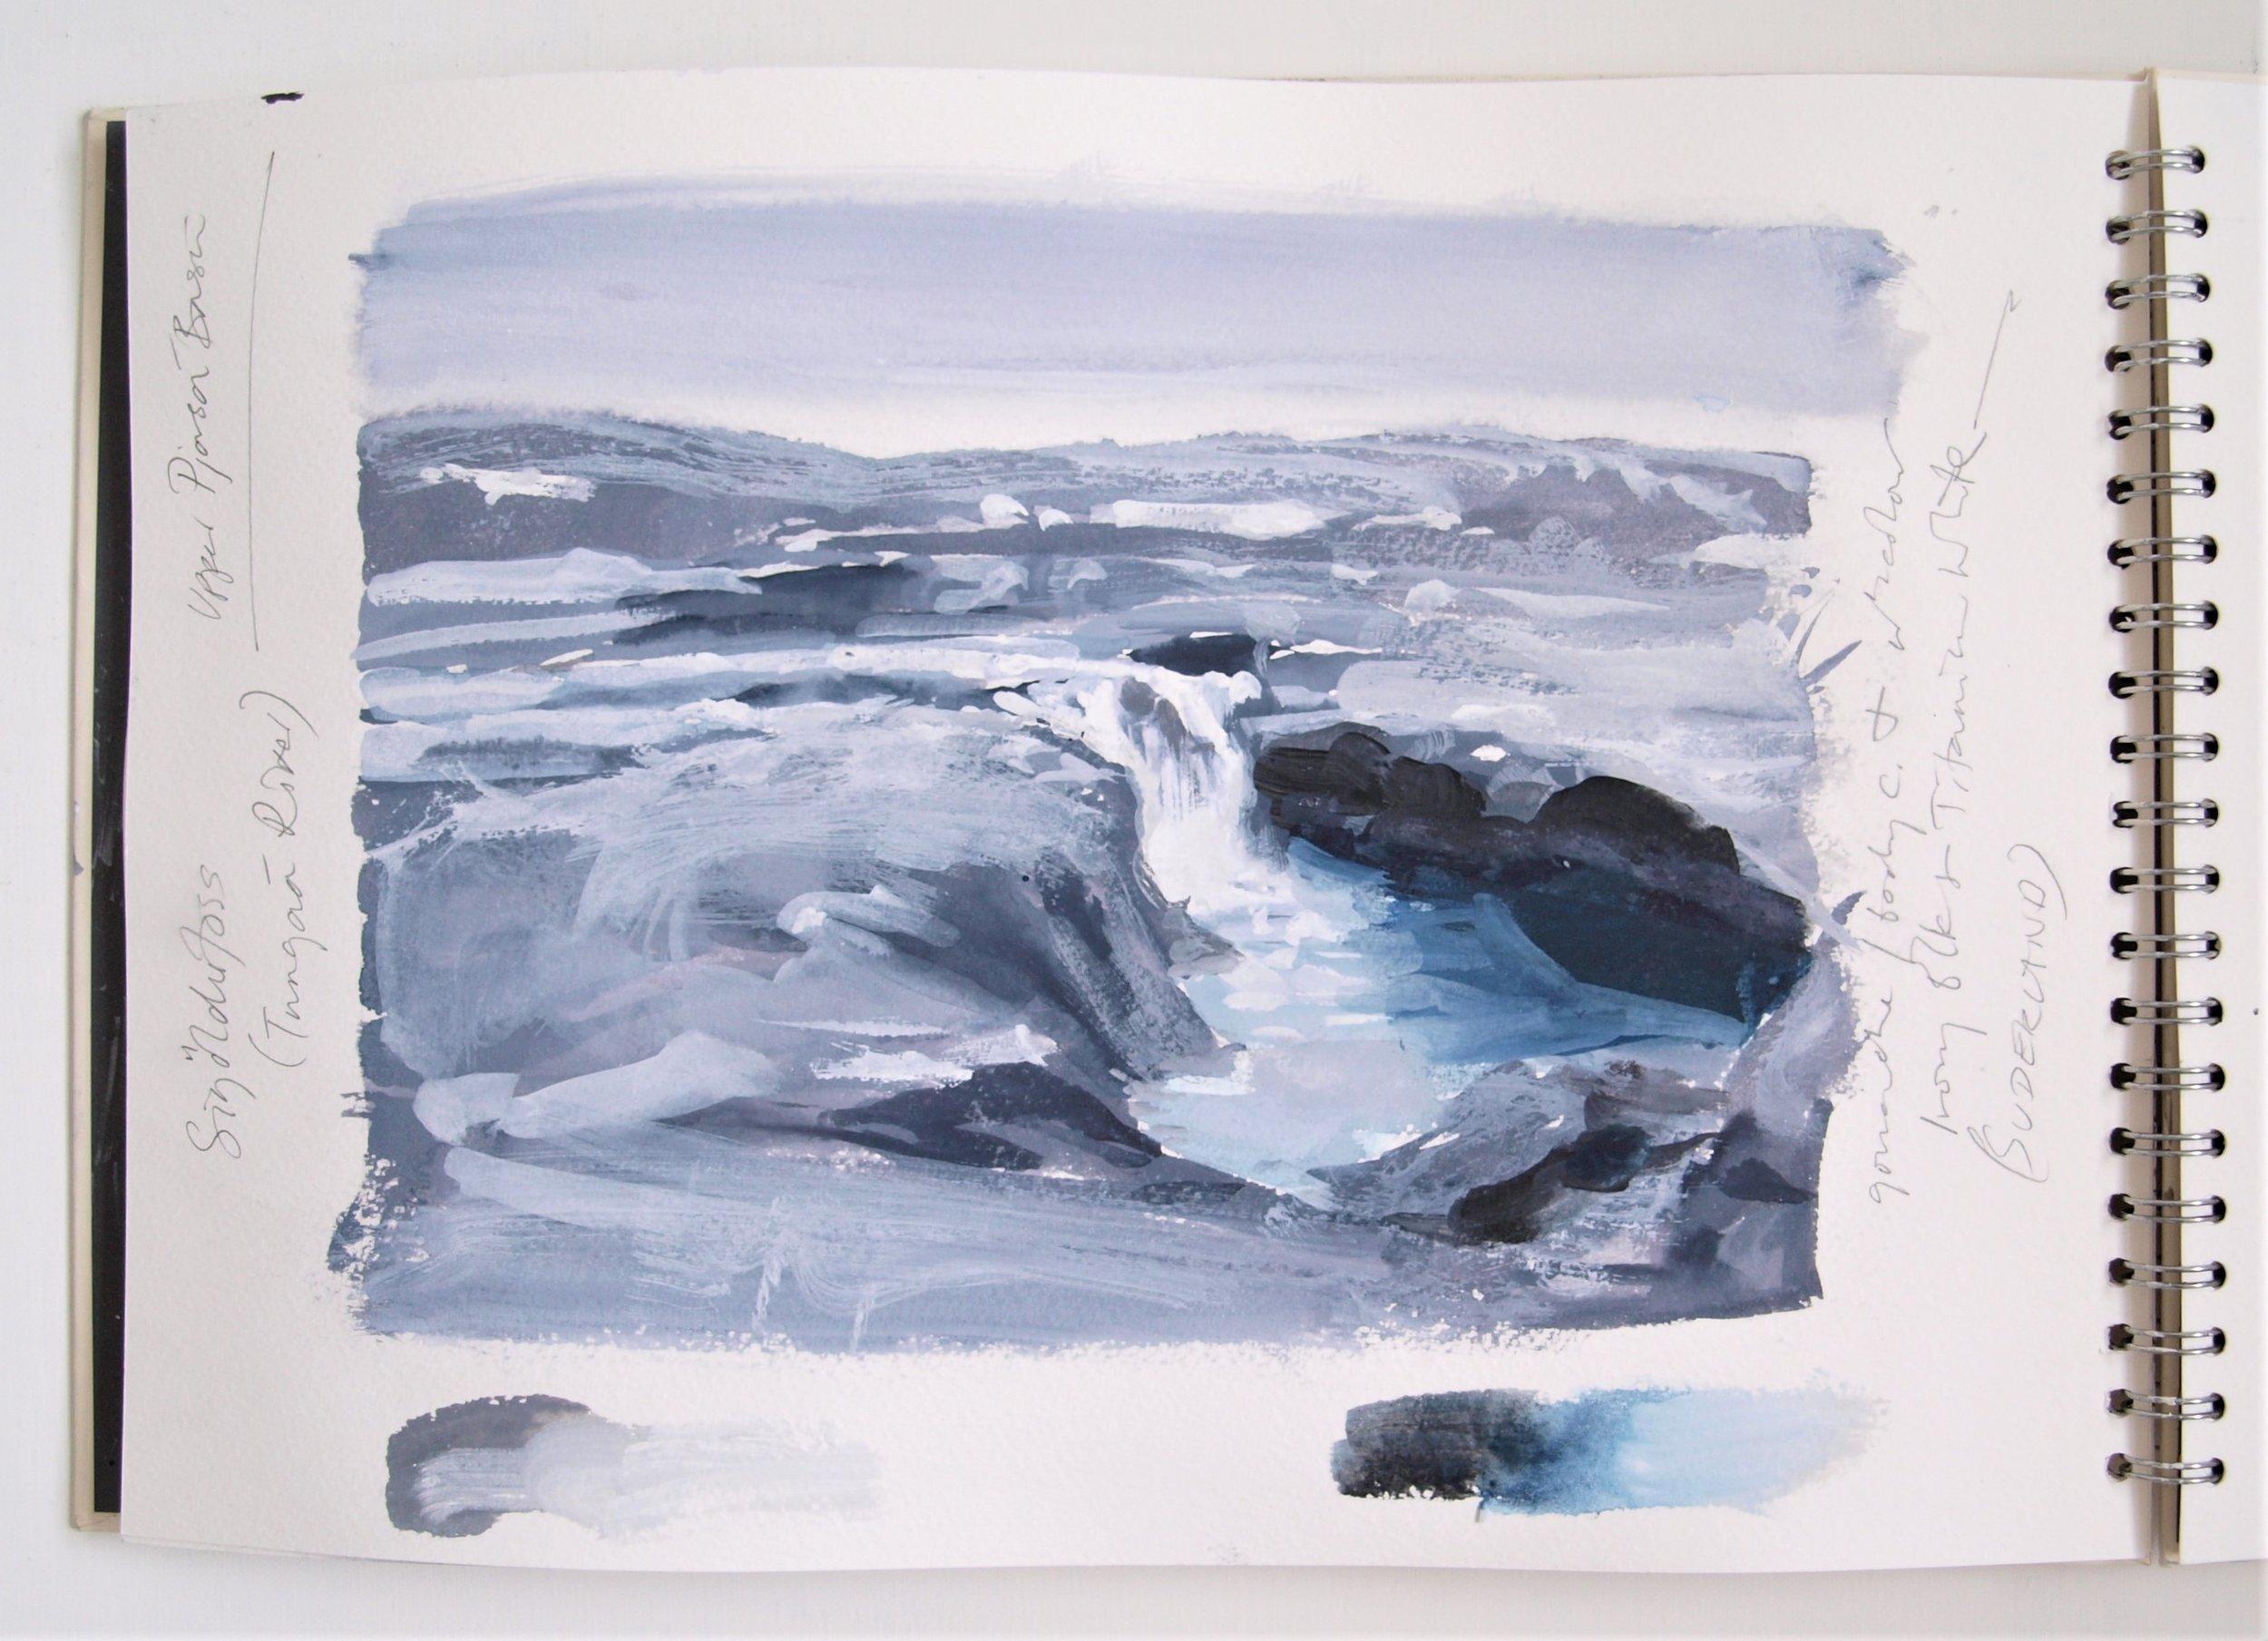 ICELAND LIGHT INTO DARK Sketchbook 2016 (page 9) C.G.GUEST.JPG